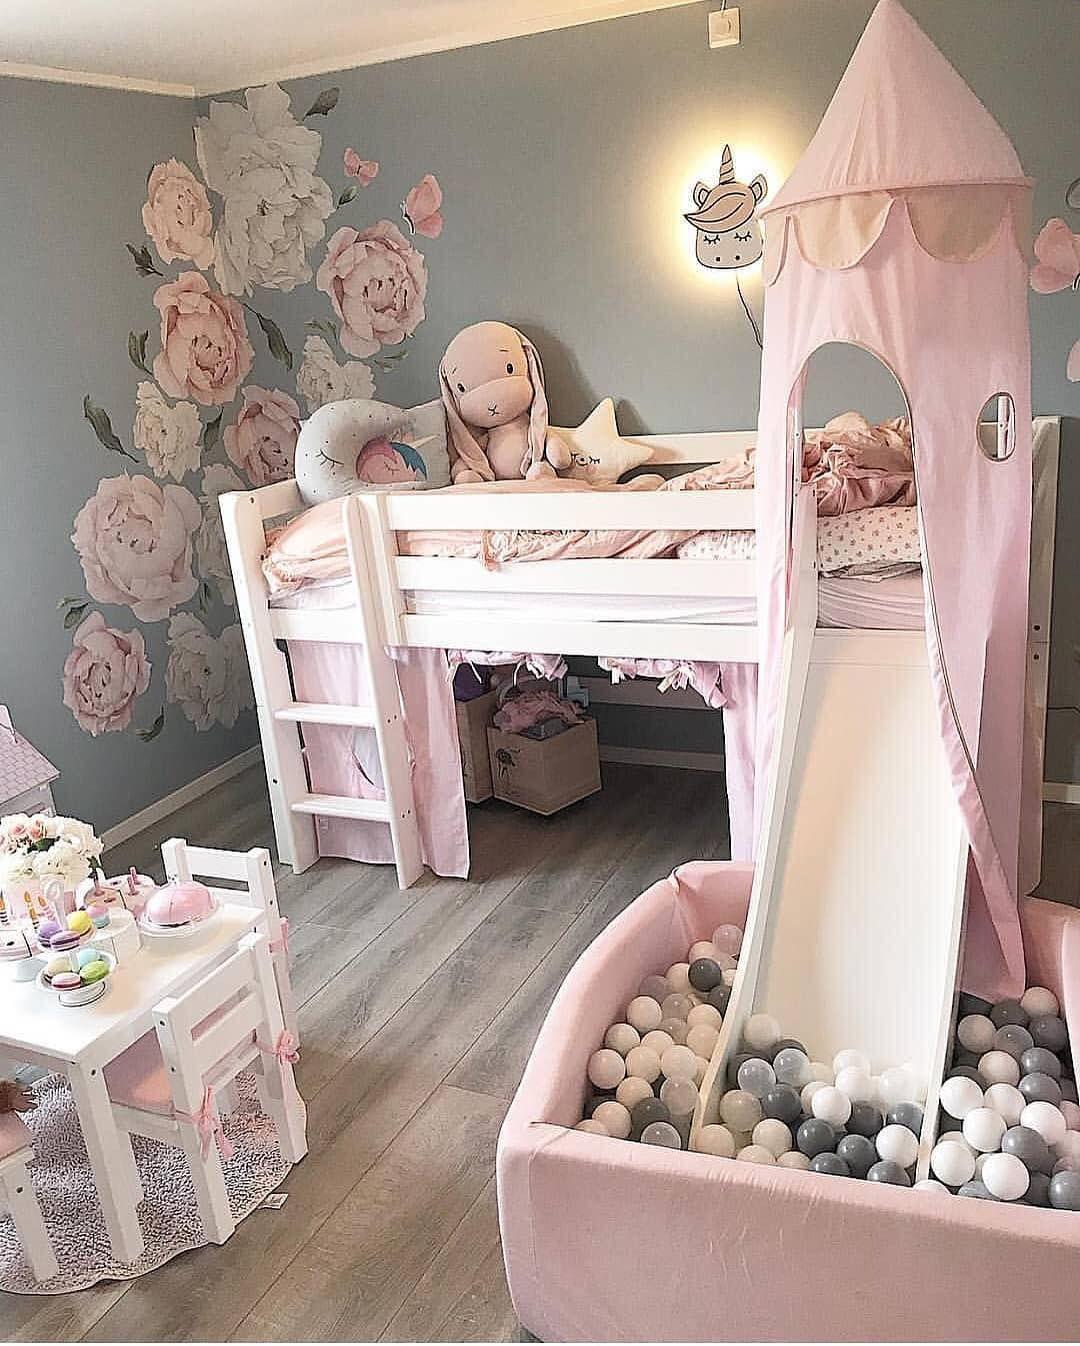 170 Kids Room Ideas Kids Bedroom Girl Room Kids Room